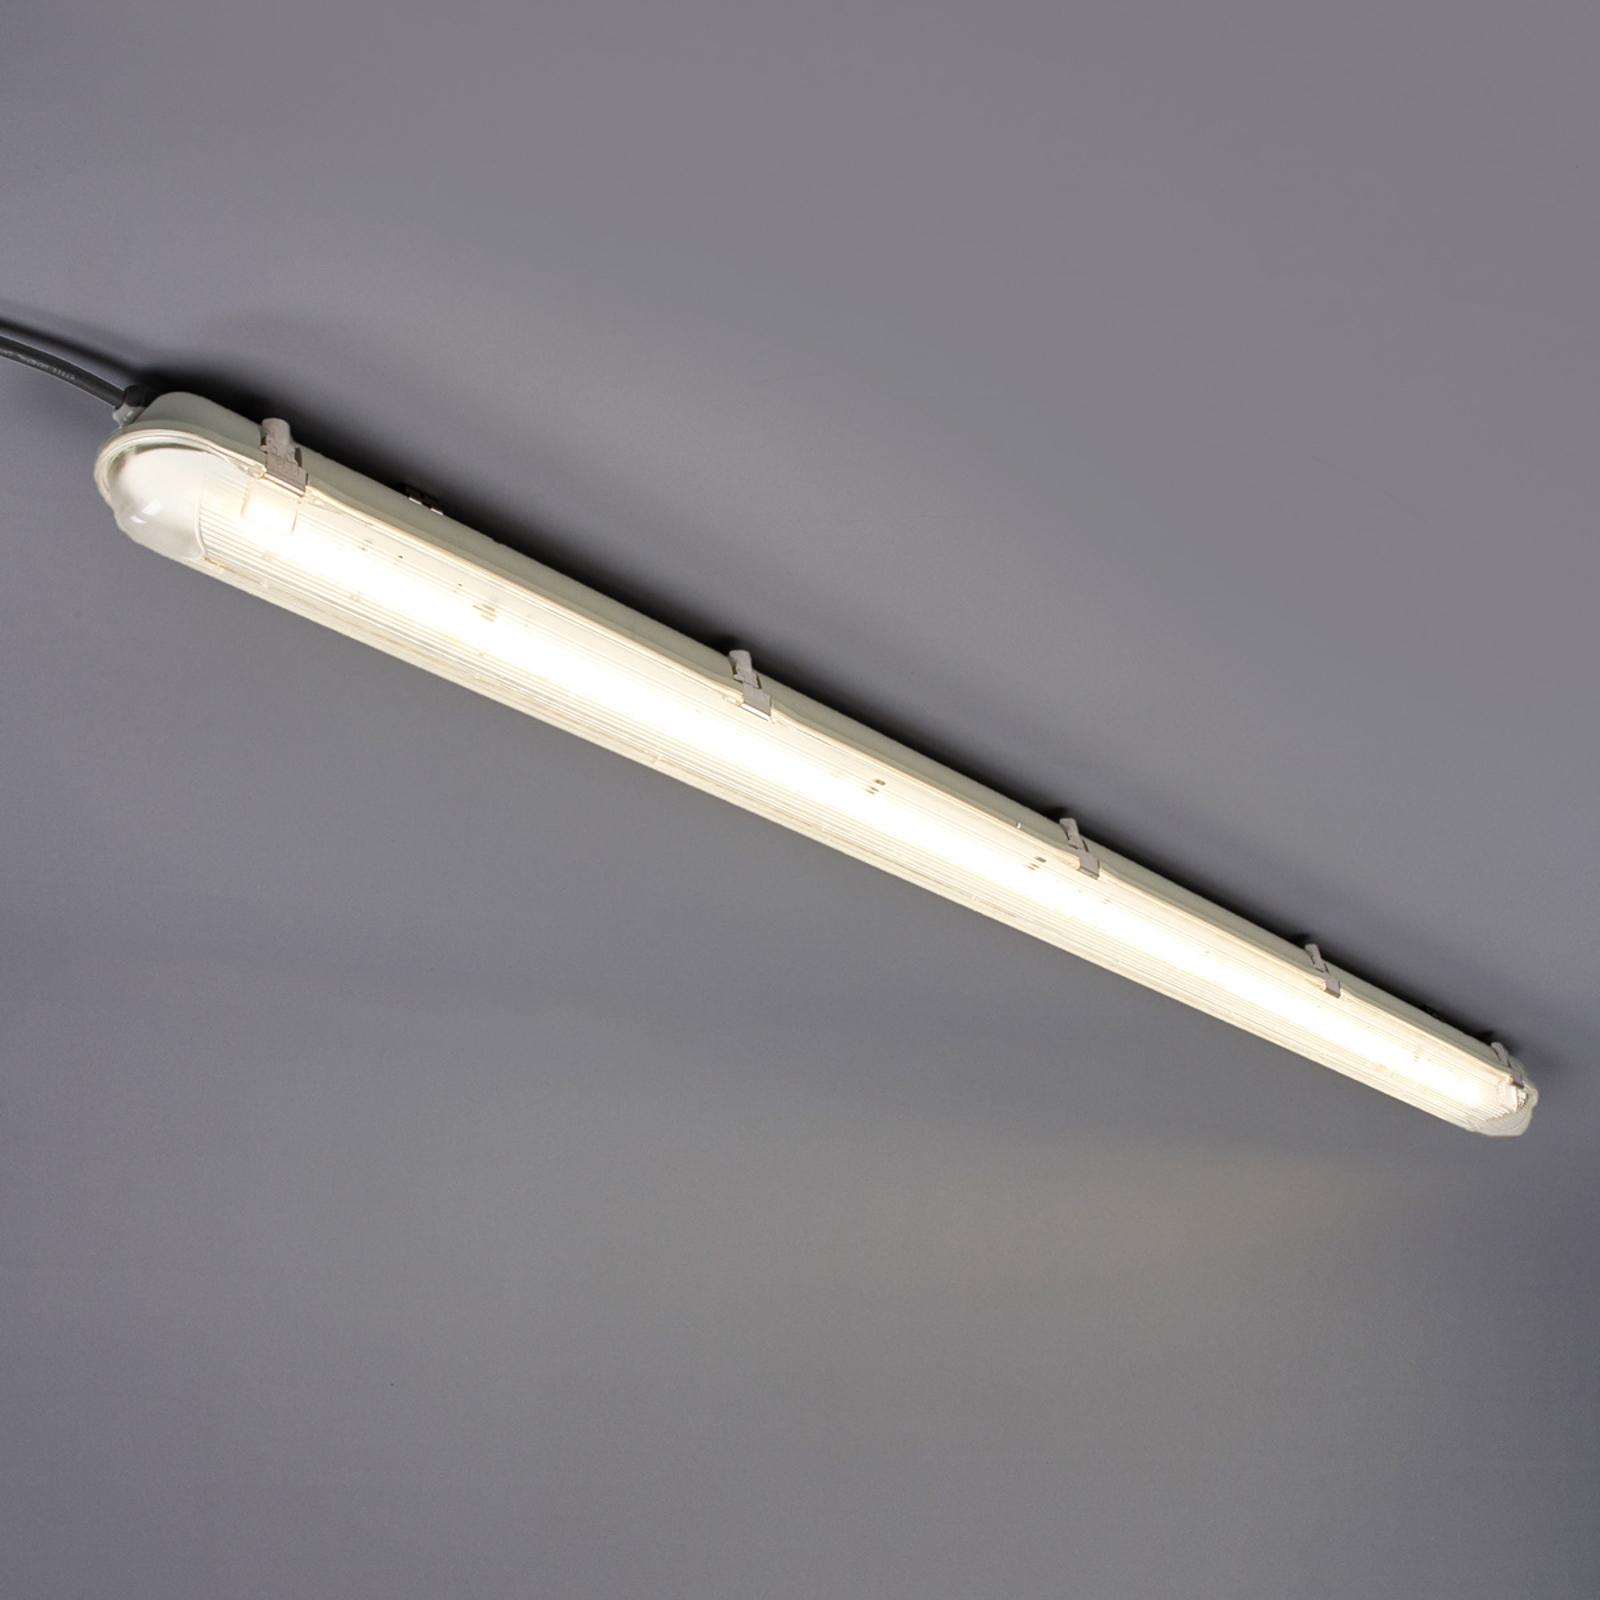 LED-Feuchtraum-Wannenleuchte, 34 W